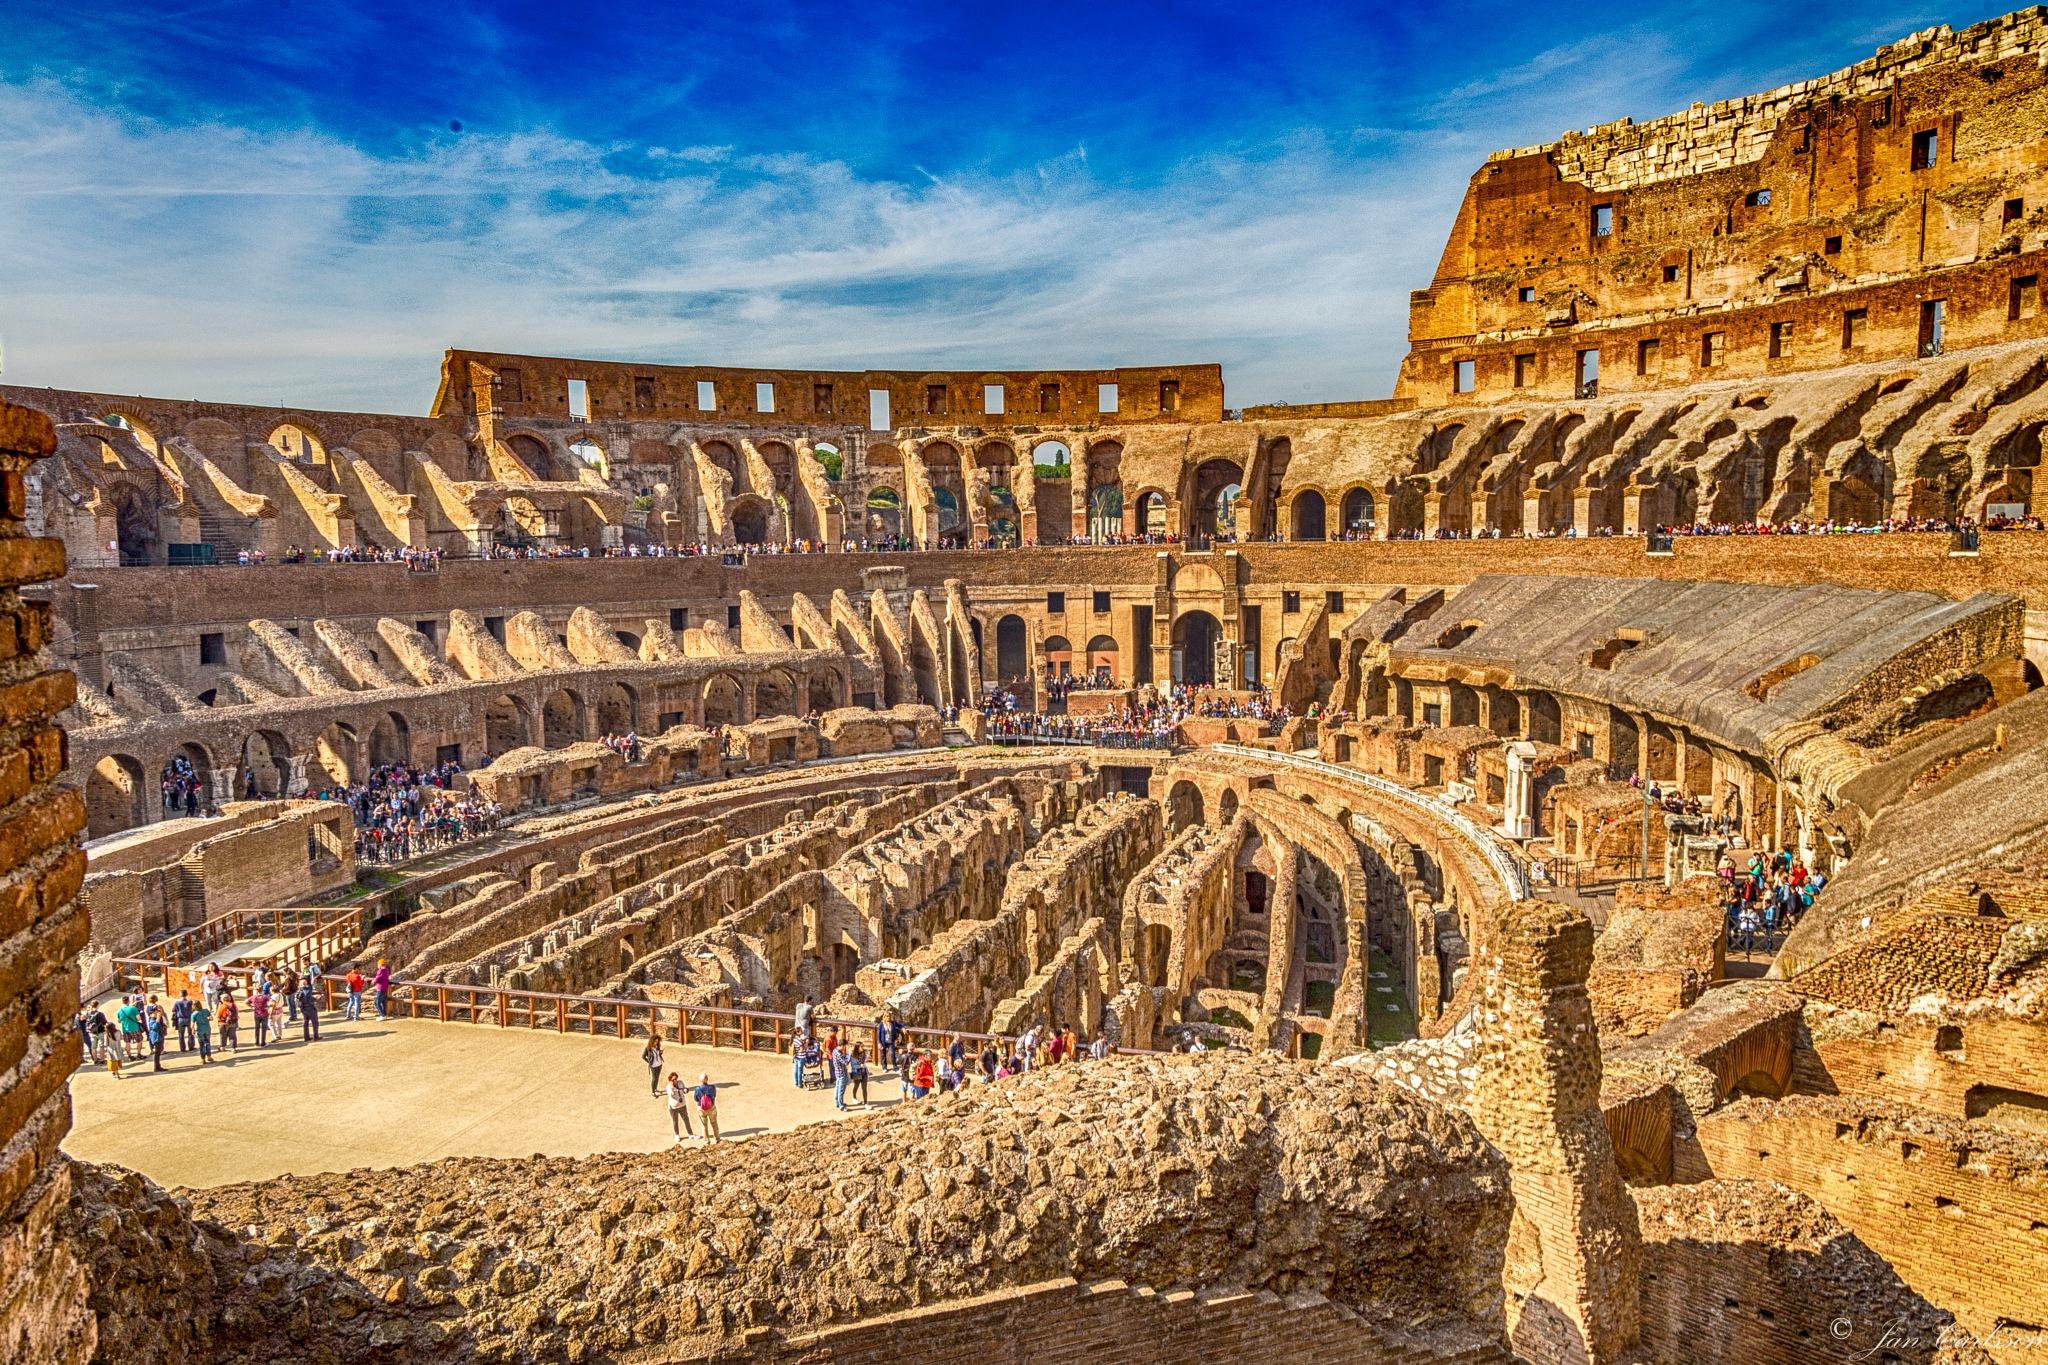 Colosseum by carljan w carlsson